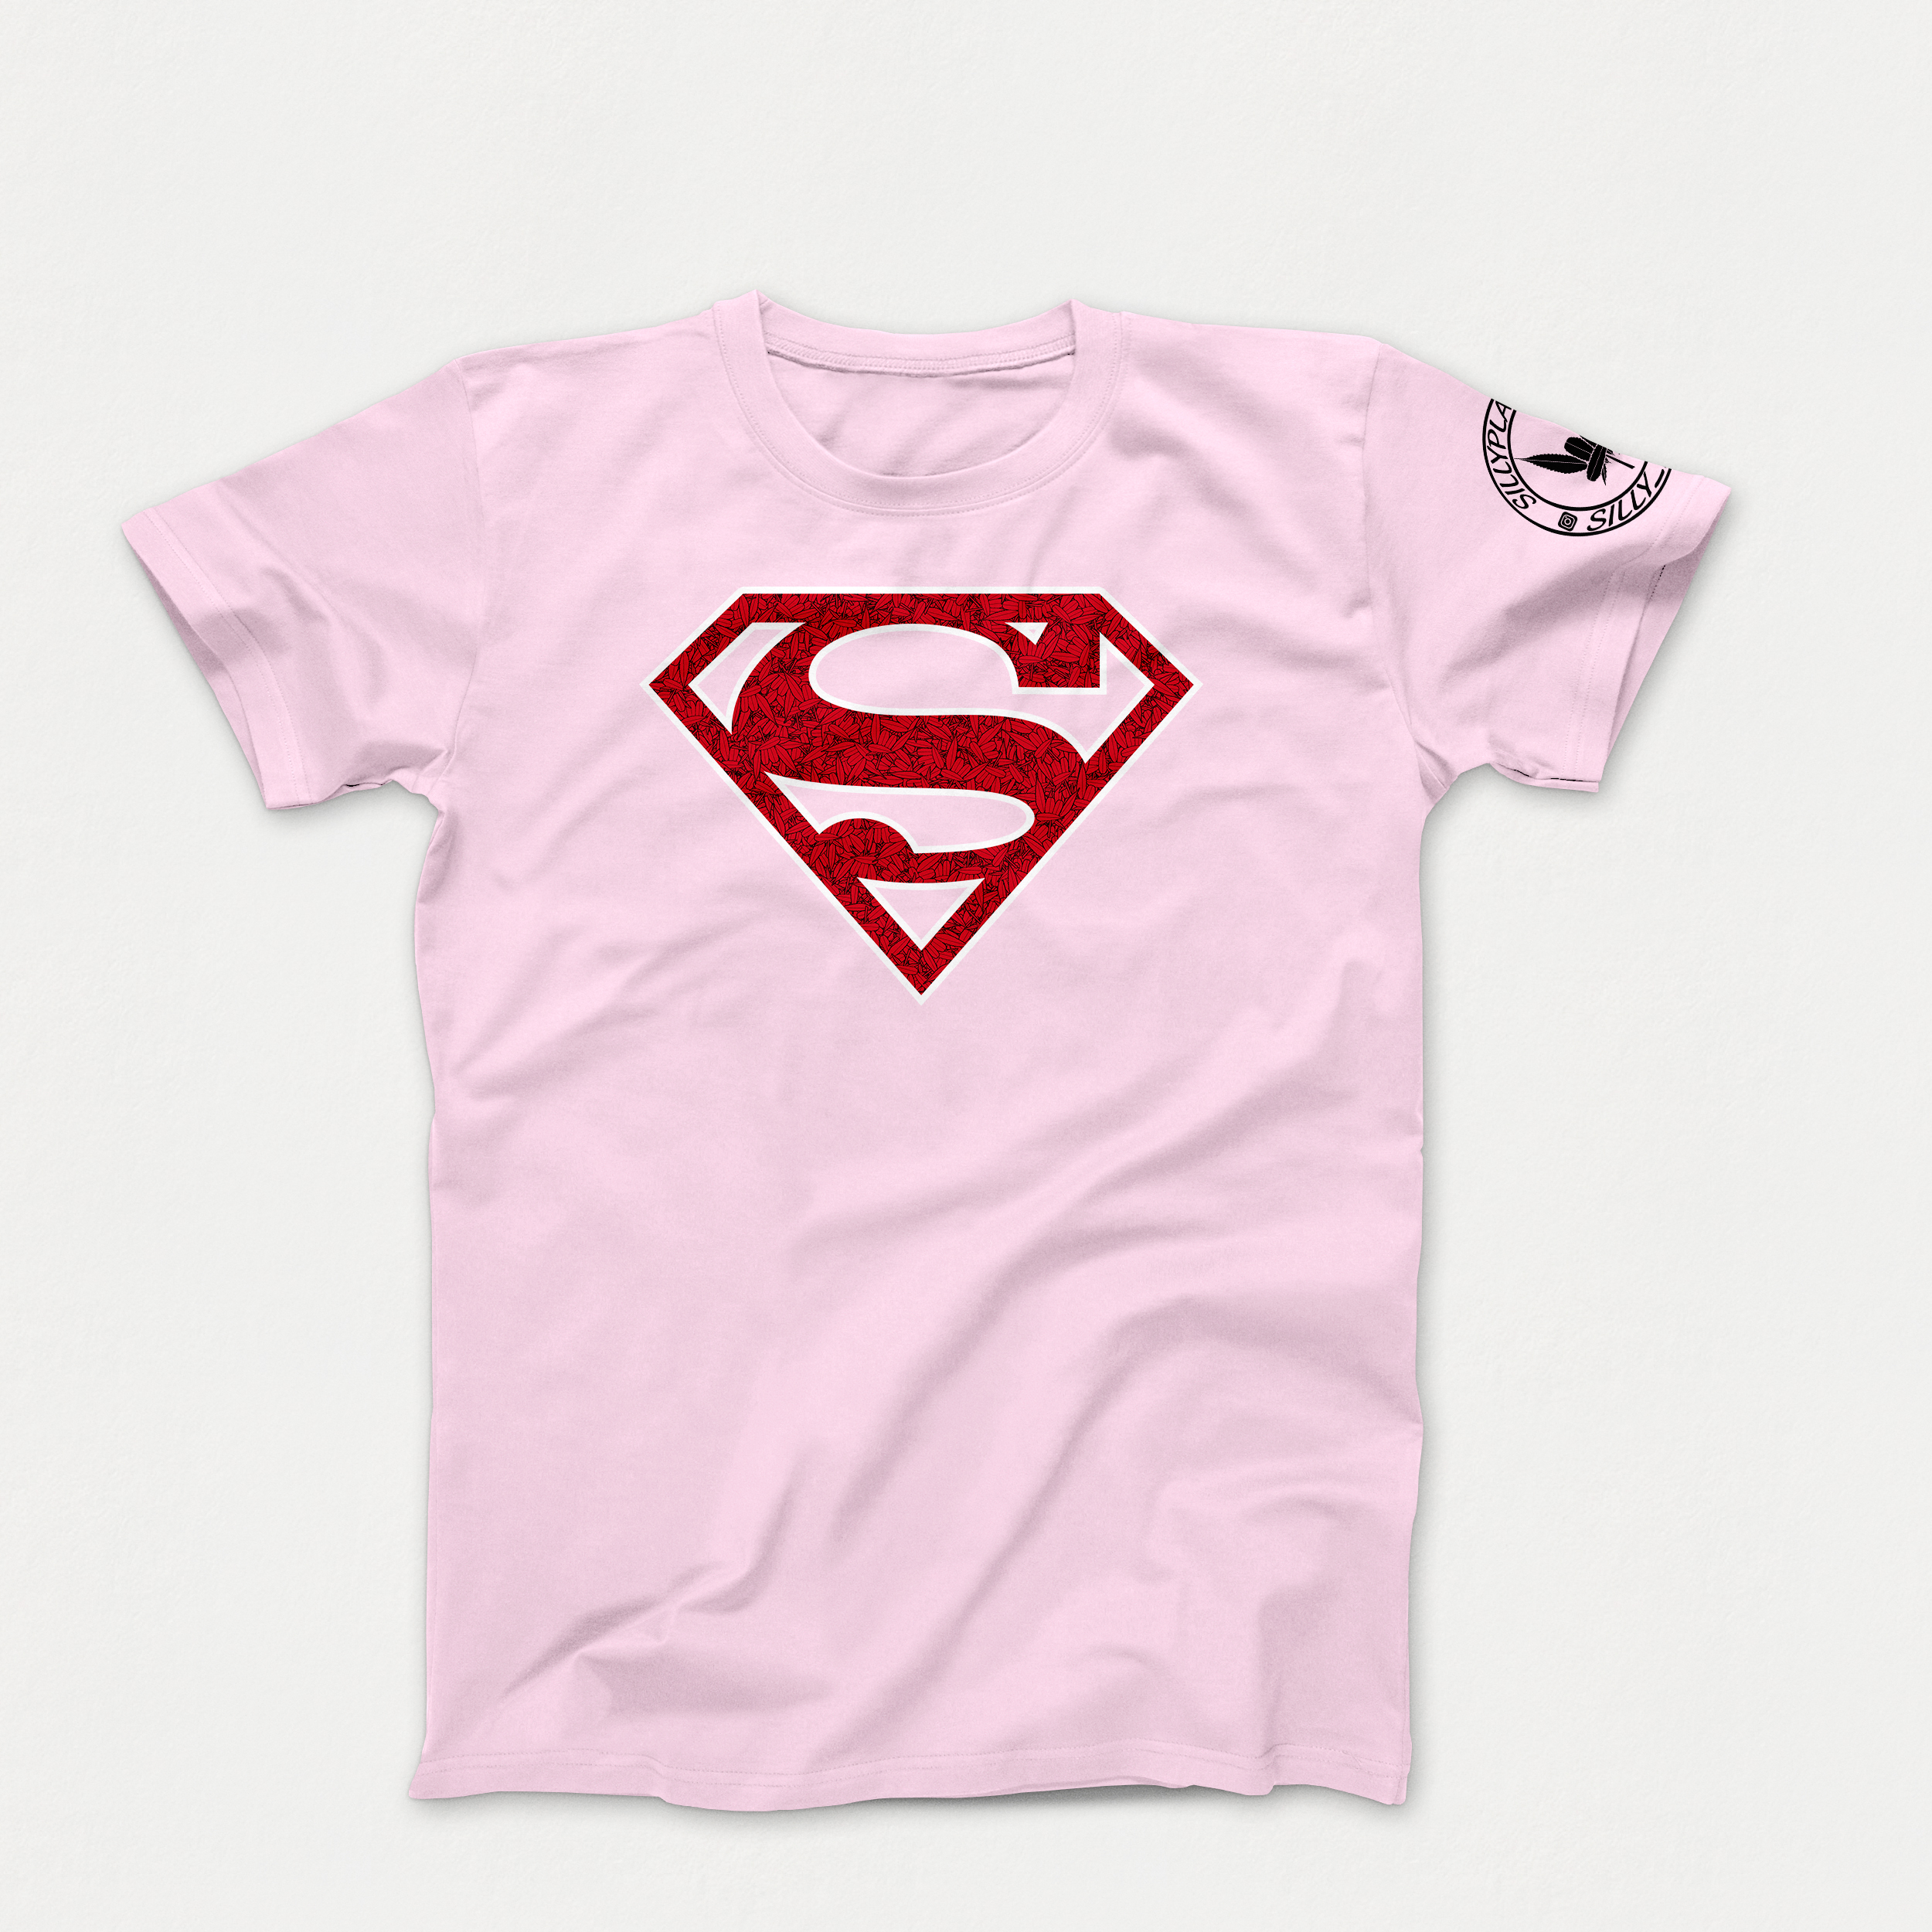 Sativa Man T-Shirt Mockup Template.jpg